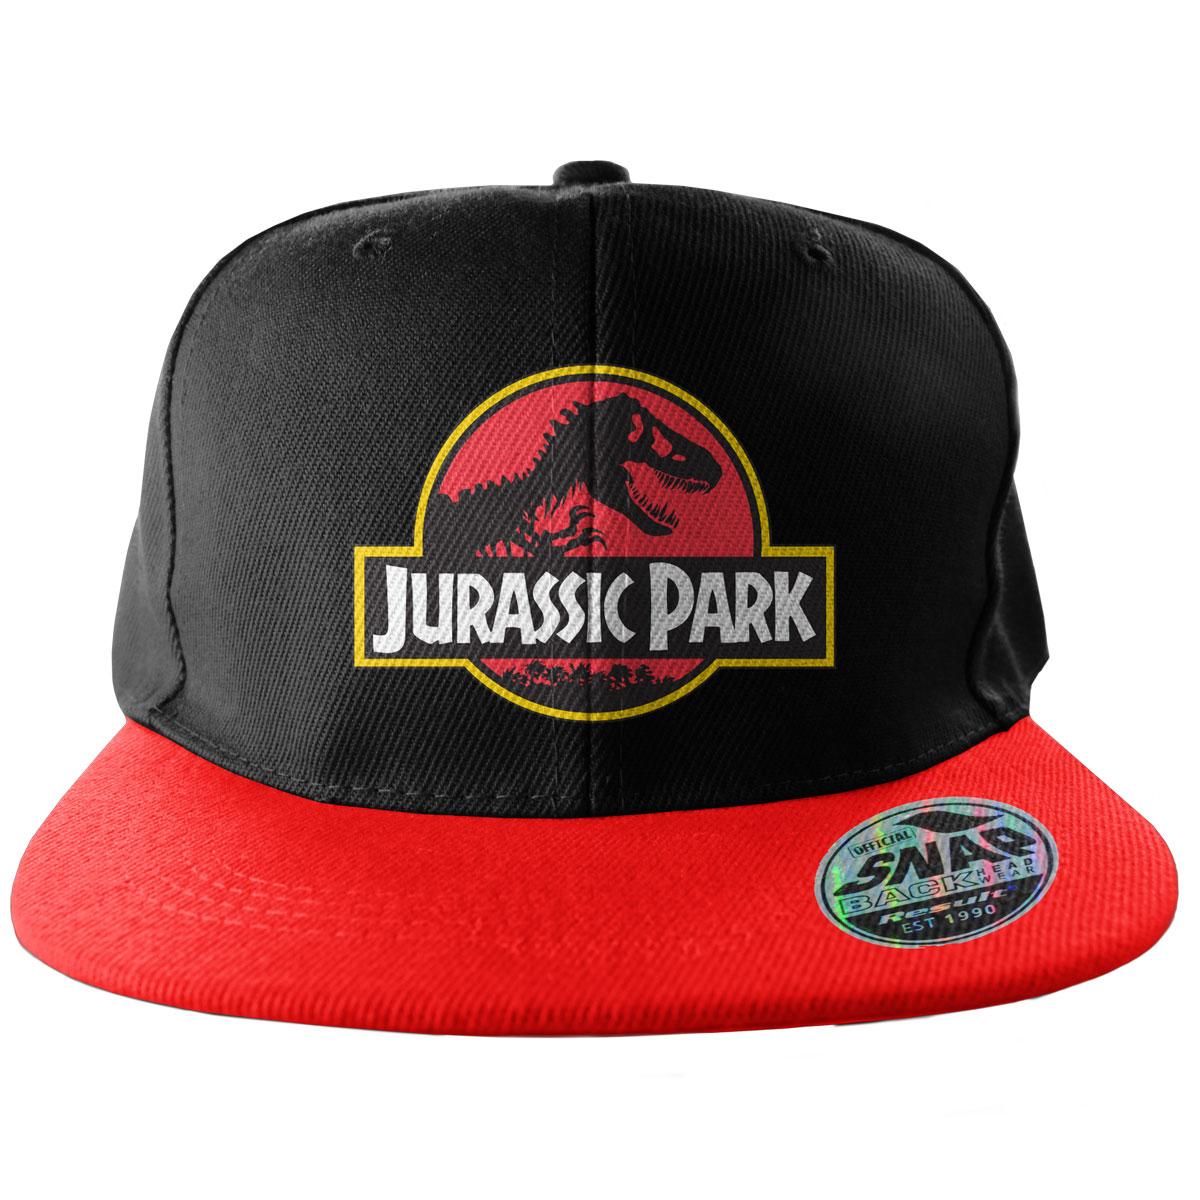 Jurassic Park Snapback Cap